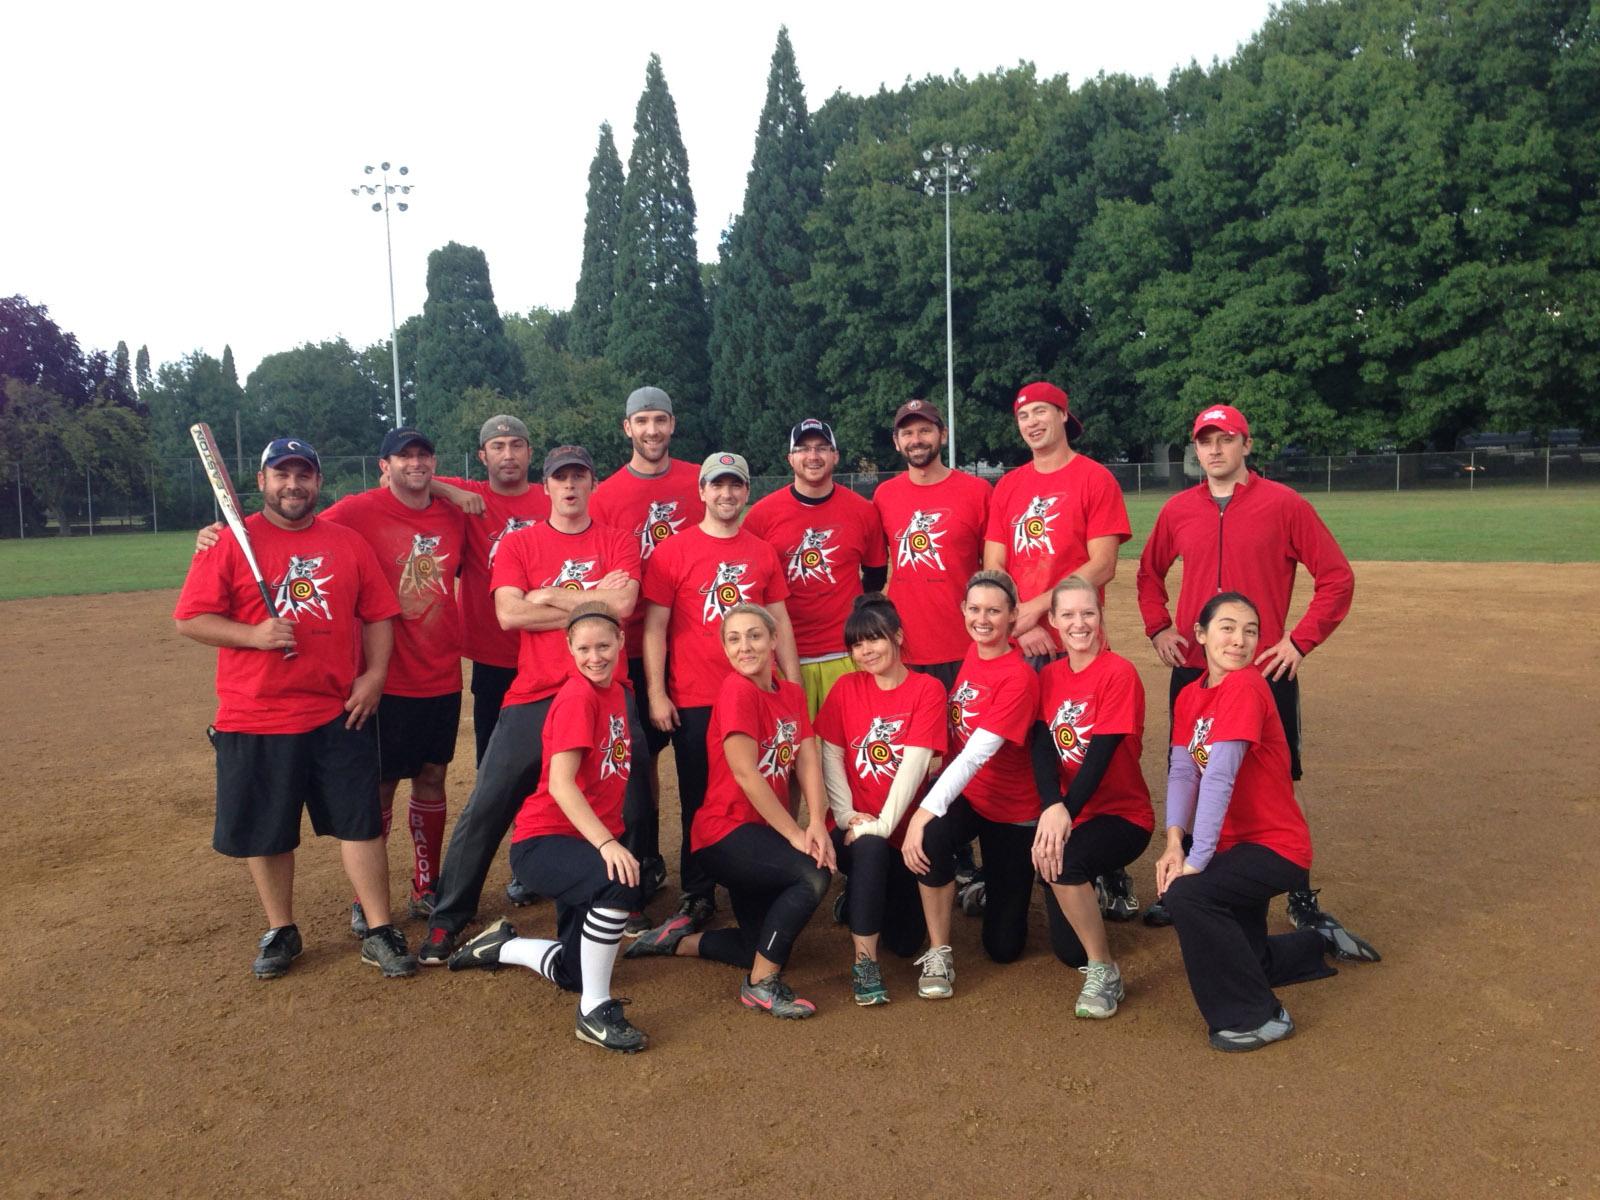 softball jerseys portland printing